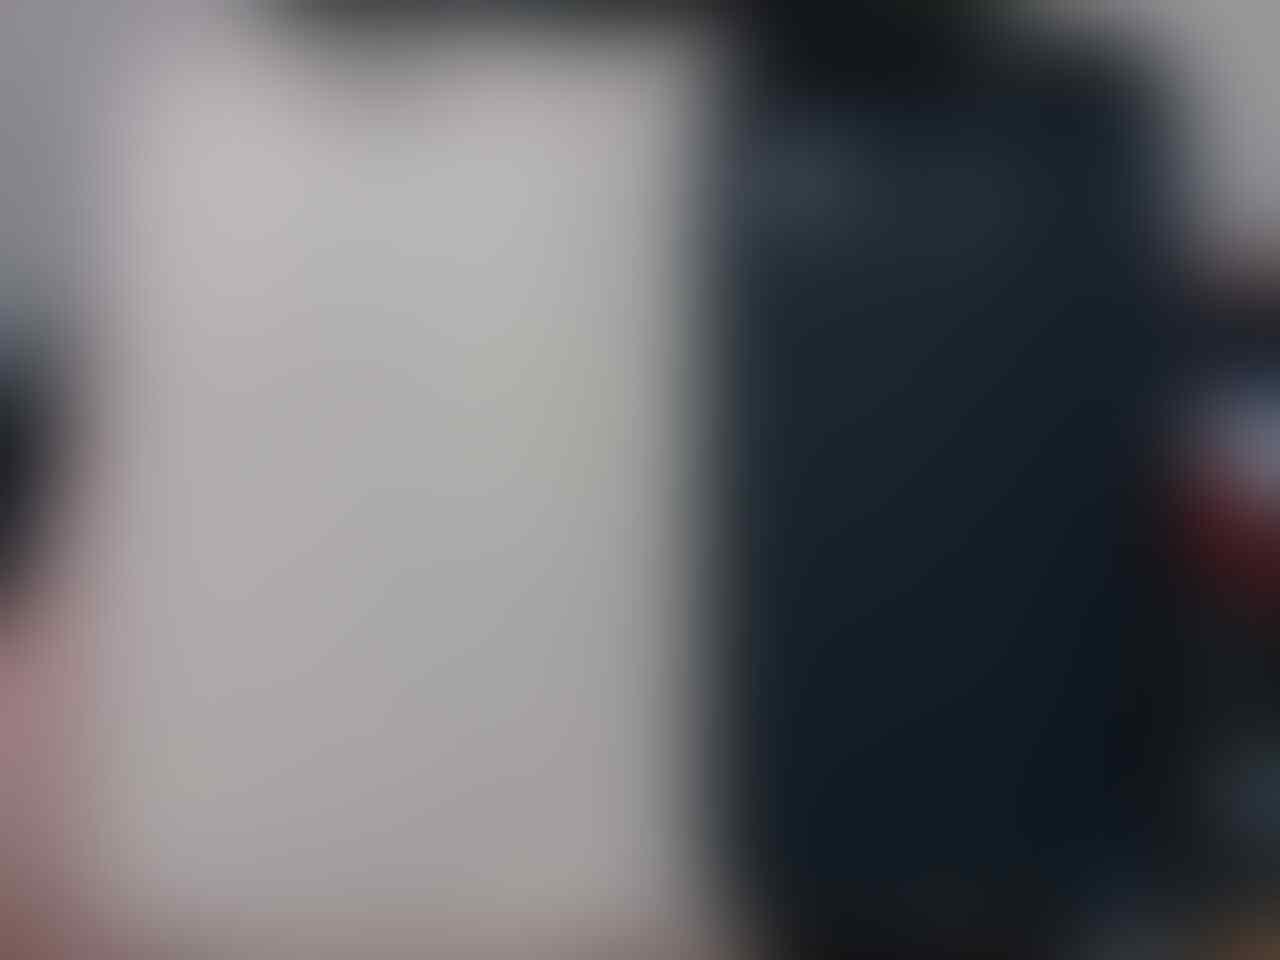 SAMSUNG GALAXY CORE DUOS GT-18262, SUPER MULUS + LENGKAP 100%